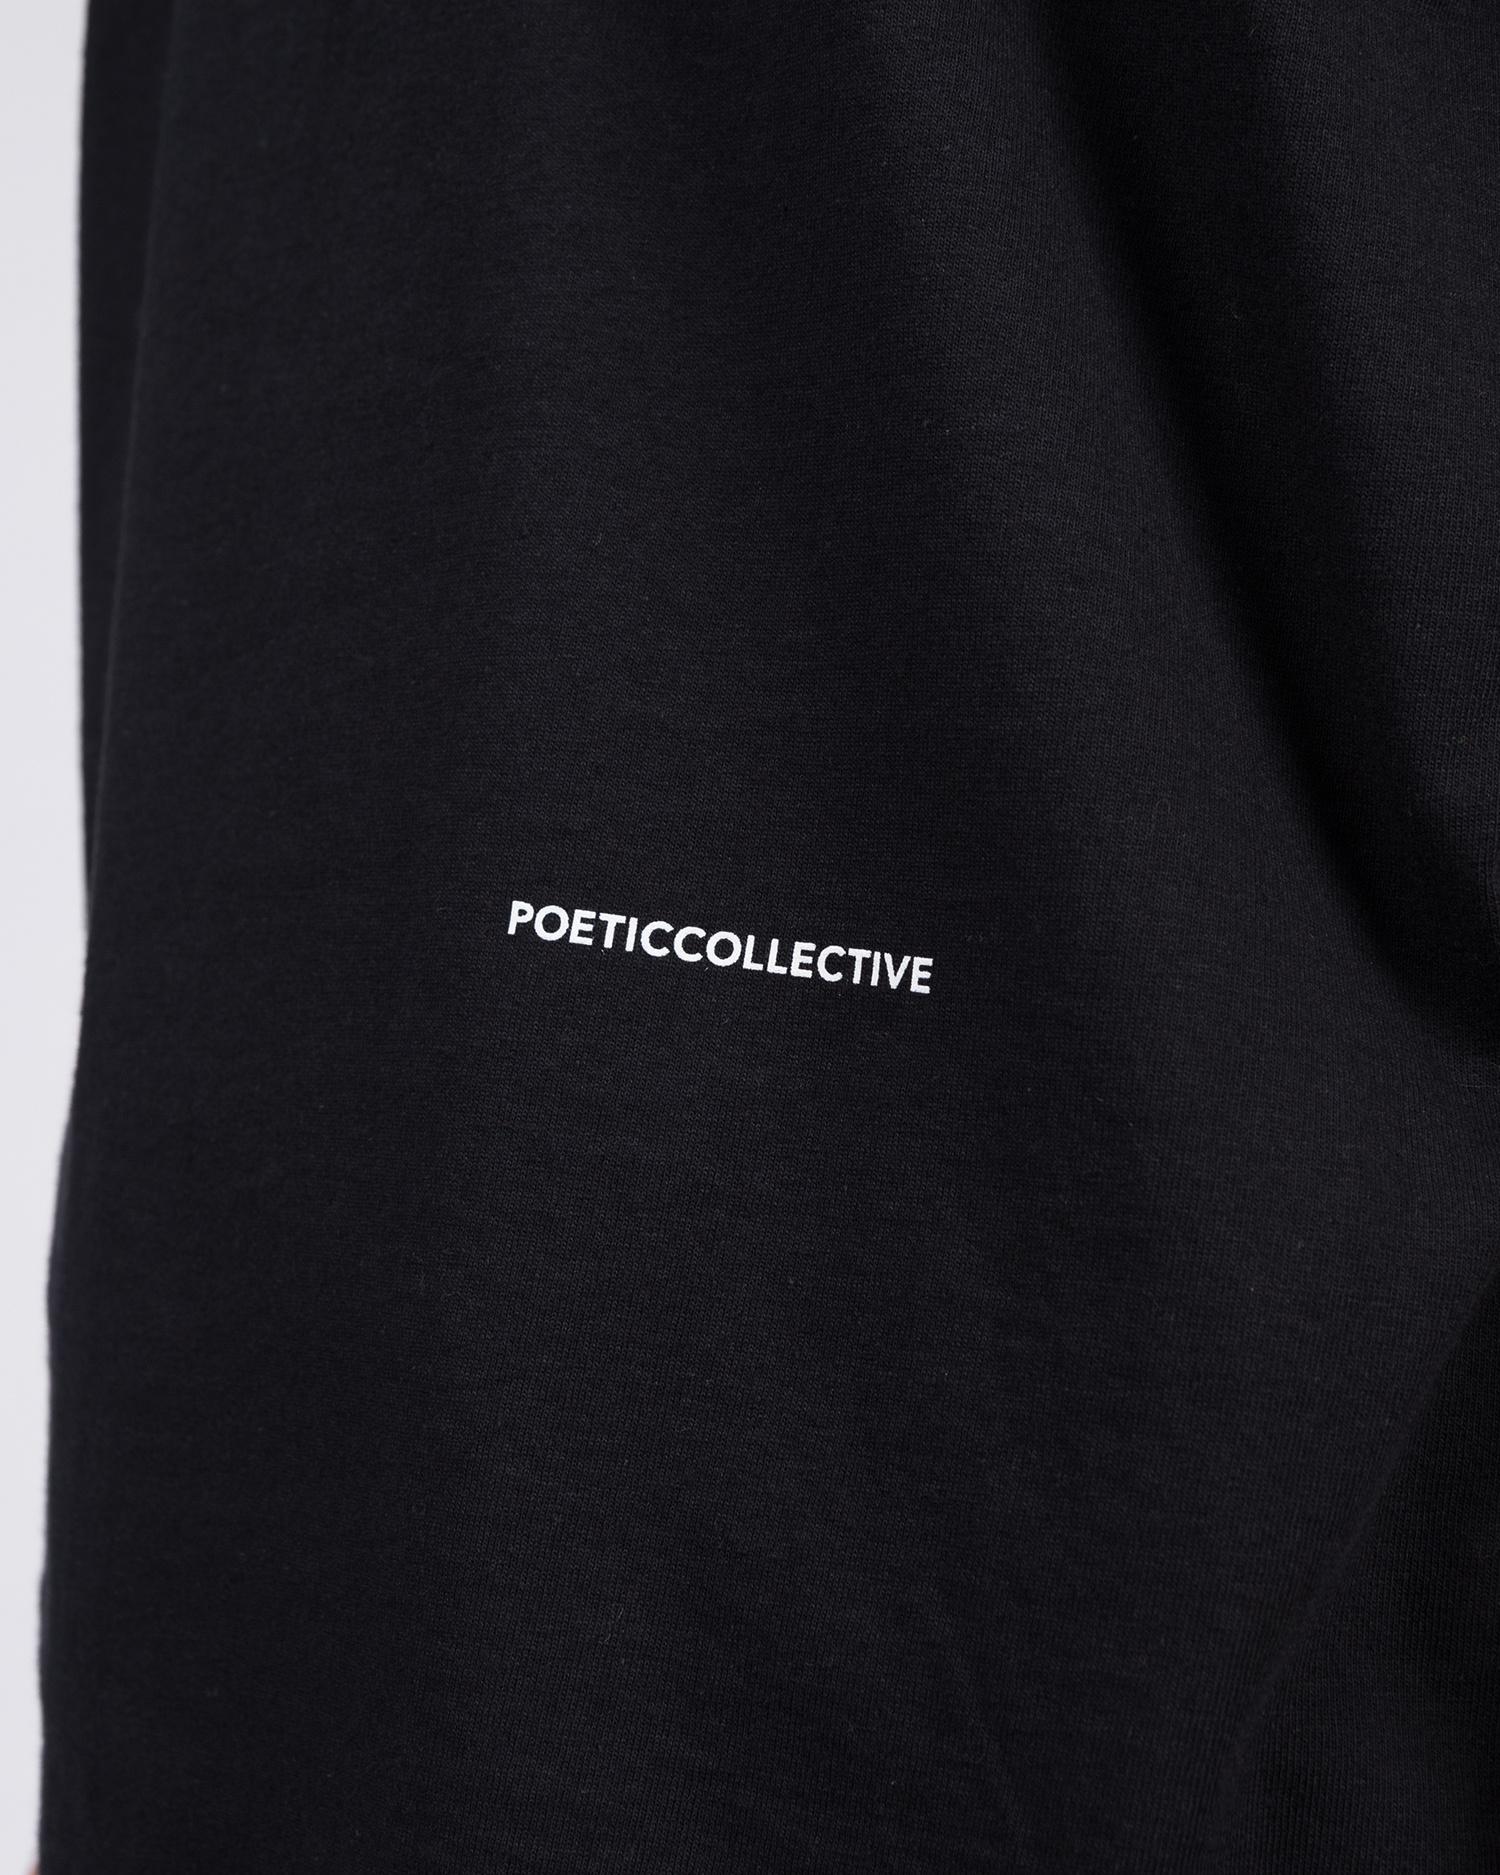 Poetic Collective Fluid Tee Black